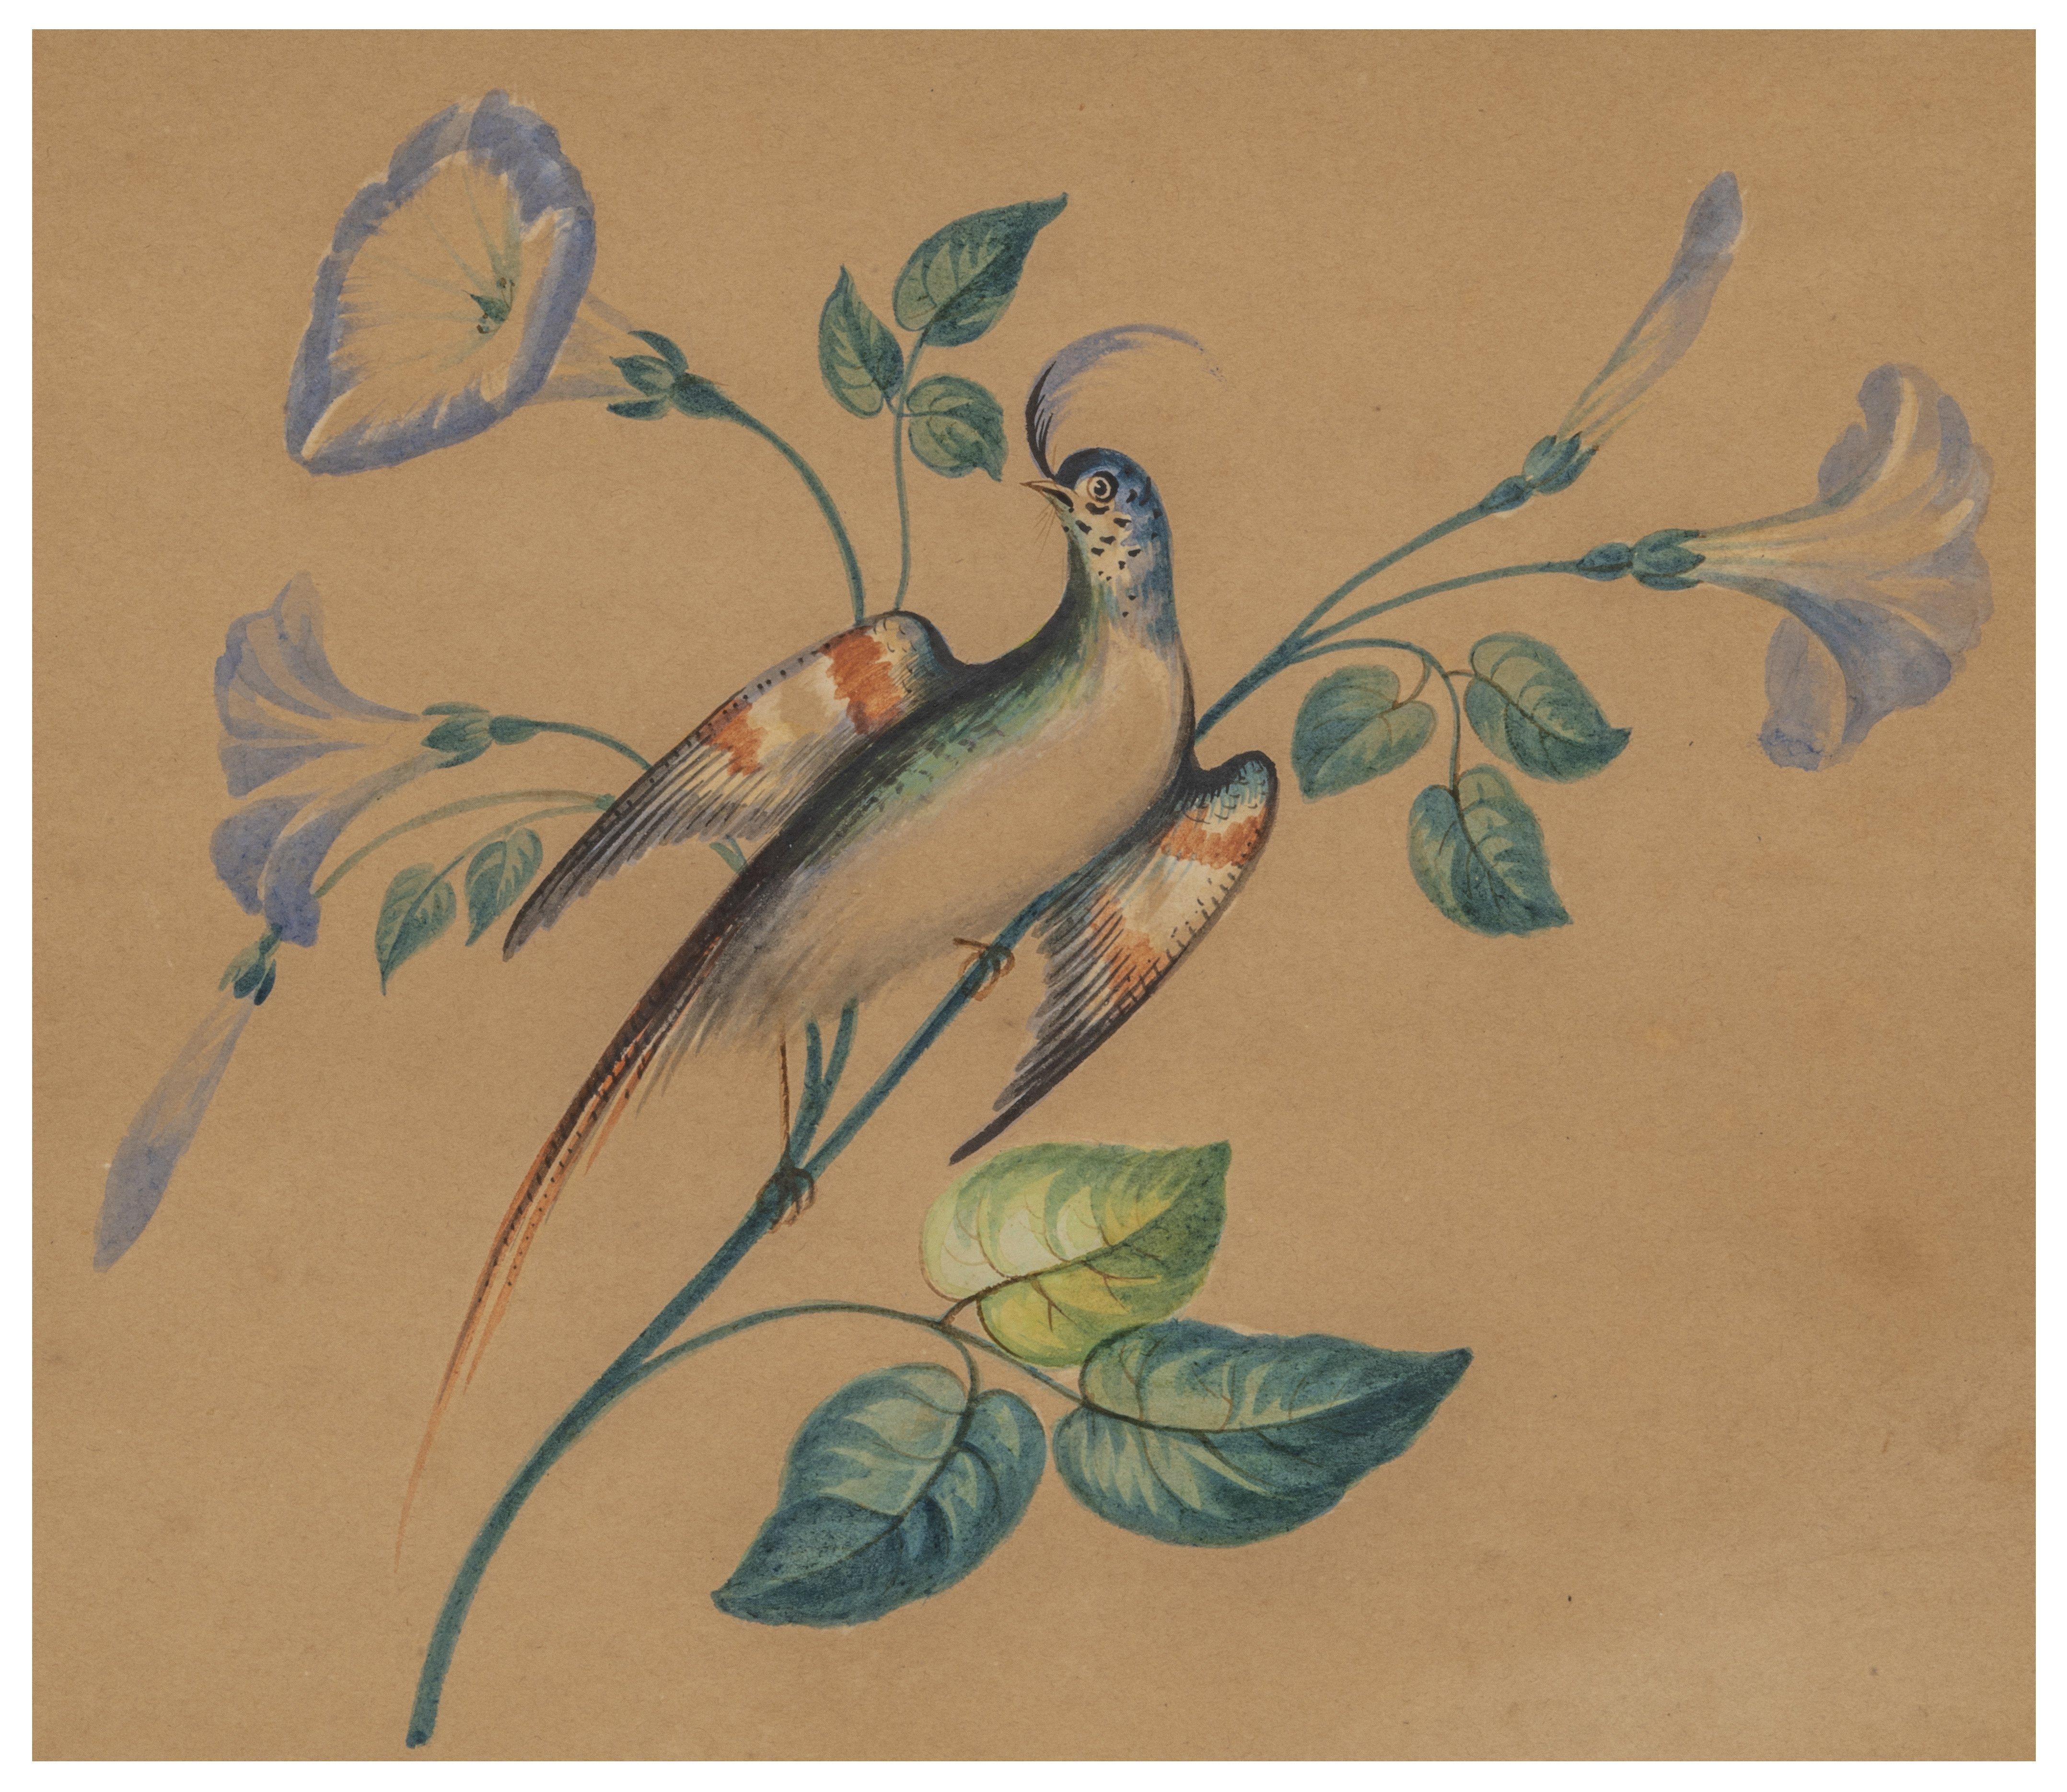 An Antique American Folk Art Watercolor Painting Bird & Flowers